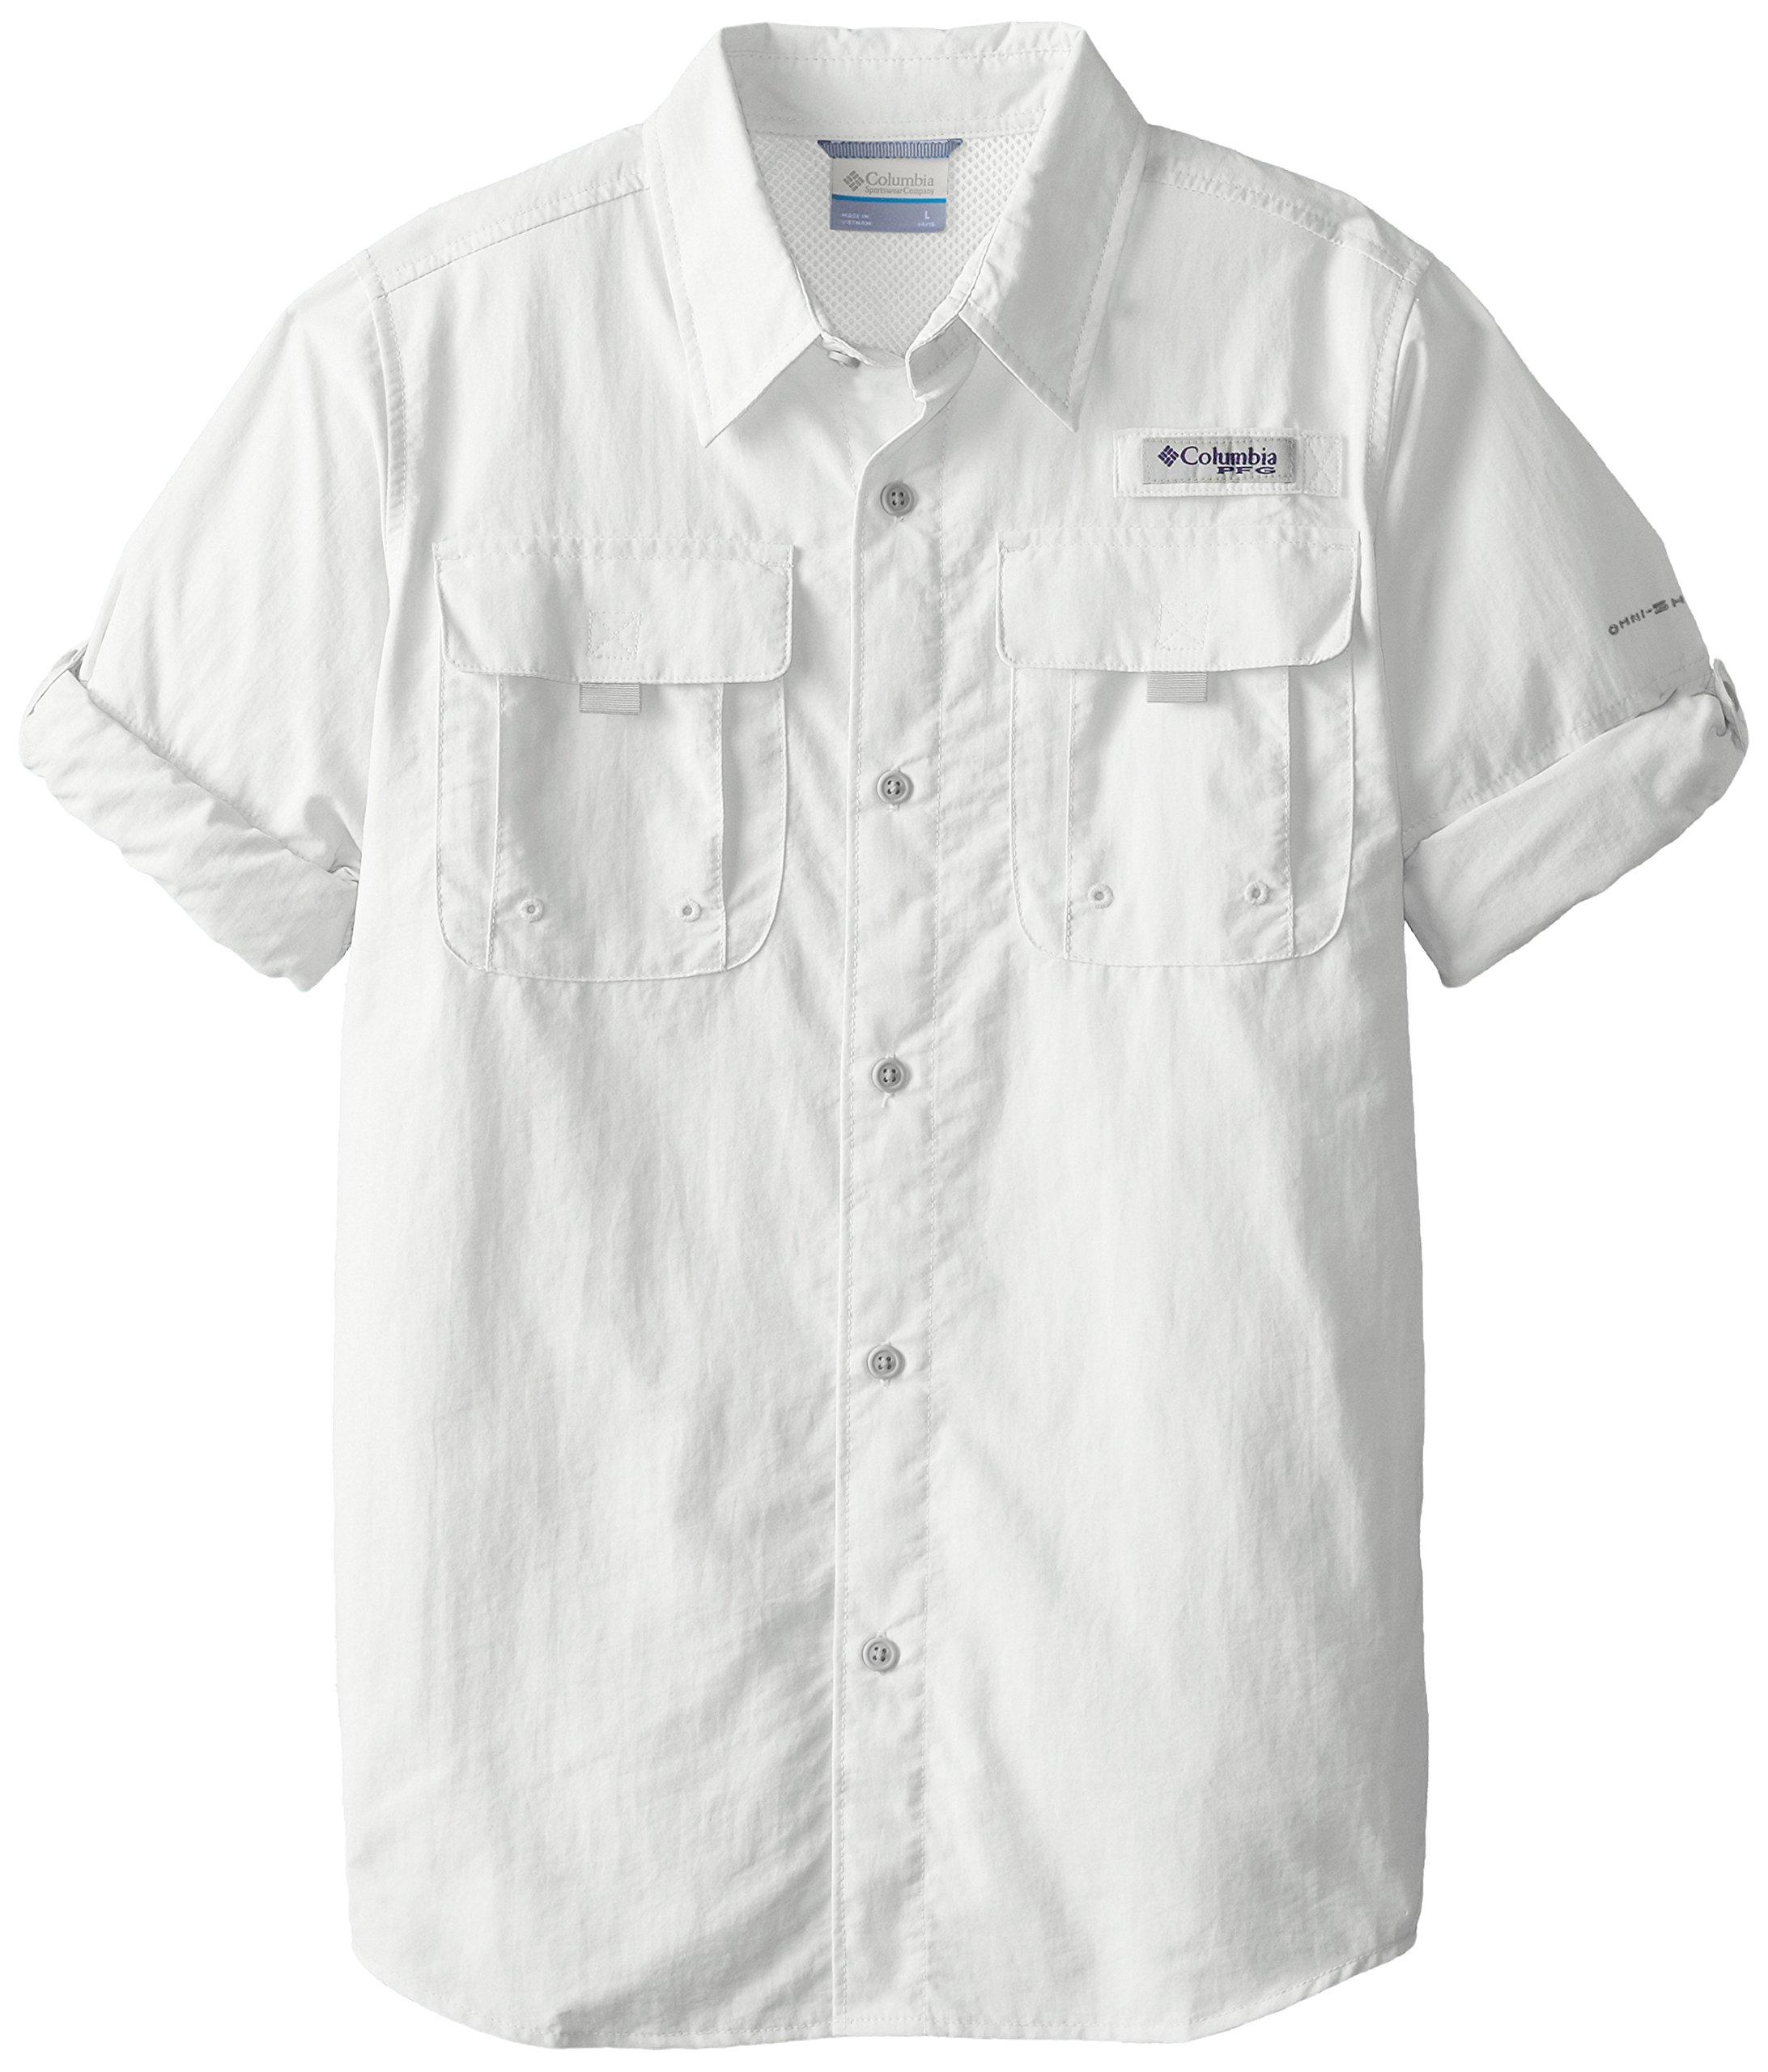 Columbia Sportswear Boy's Bahama Long Sleeve Shirt, White, Medium